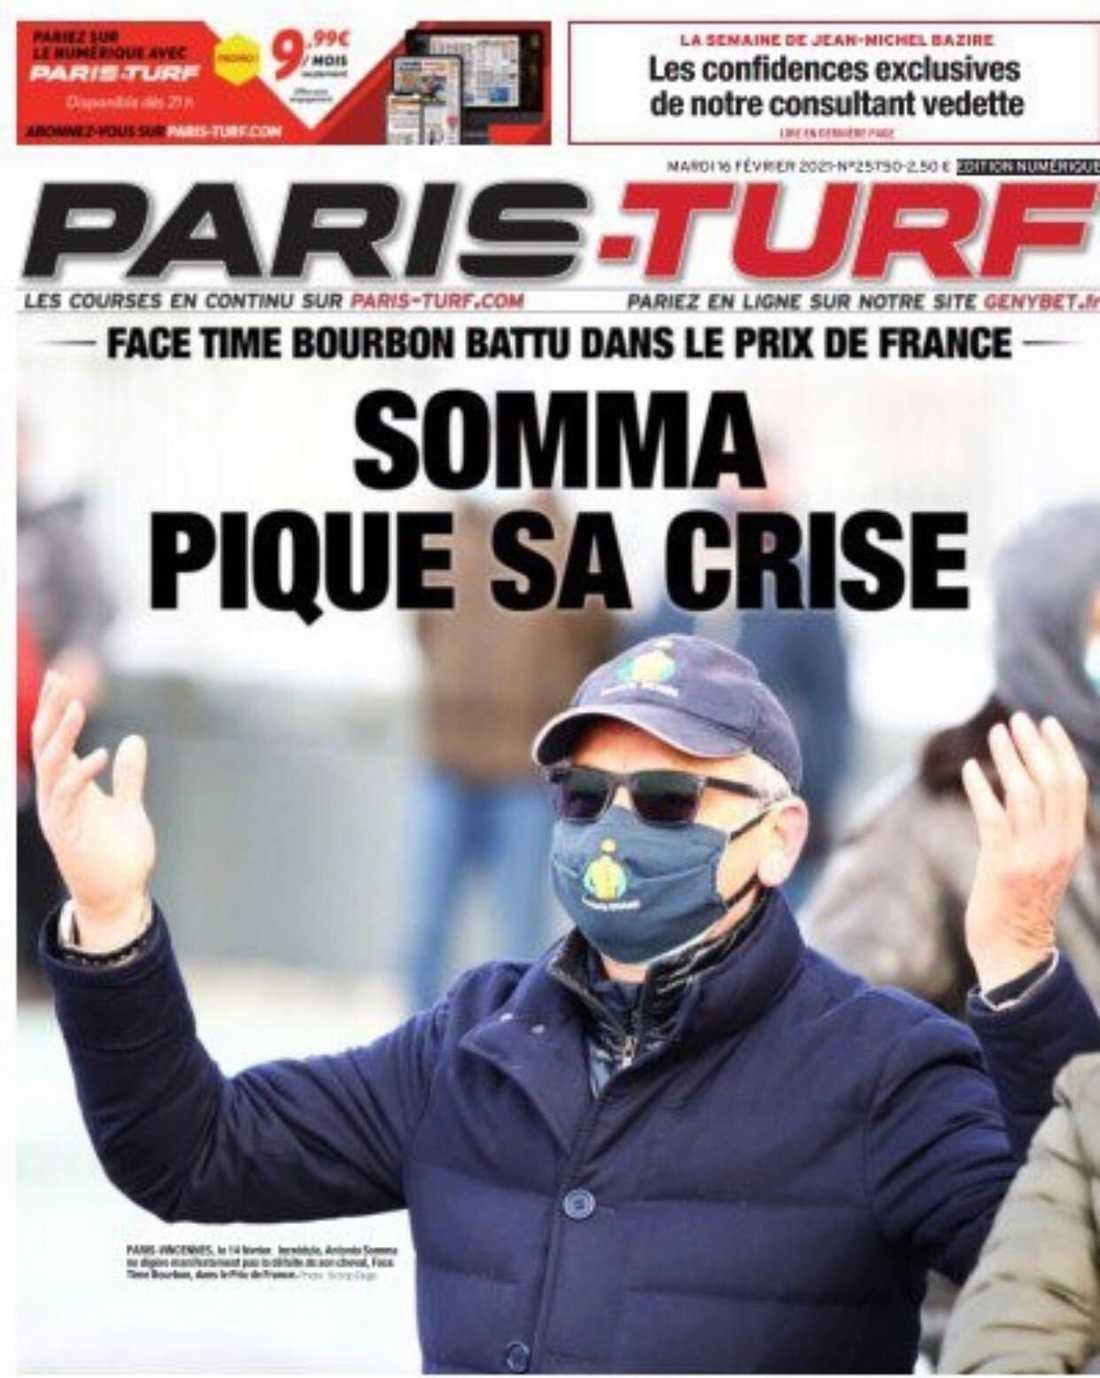 En uppgiven Antonio Somma pryder Paris-Turfs sida.